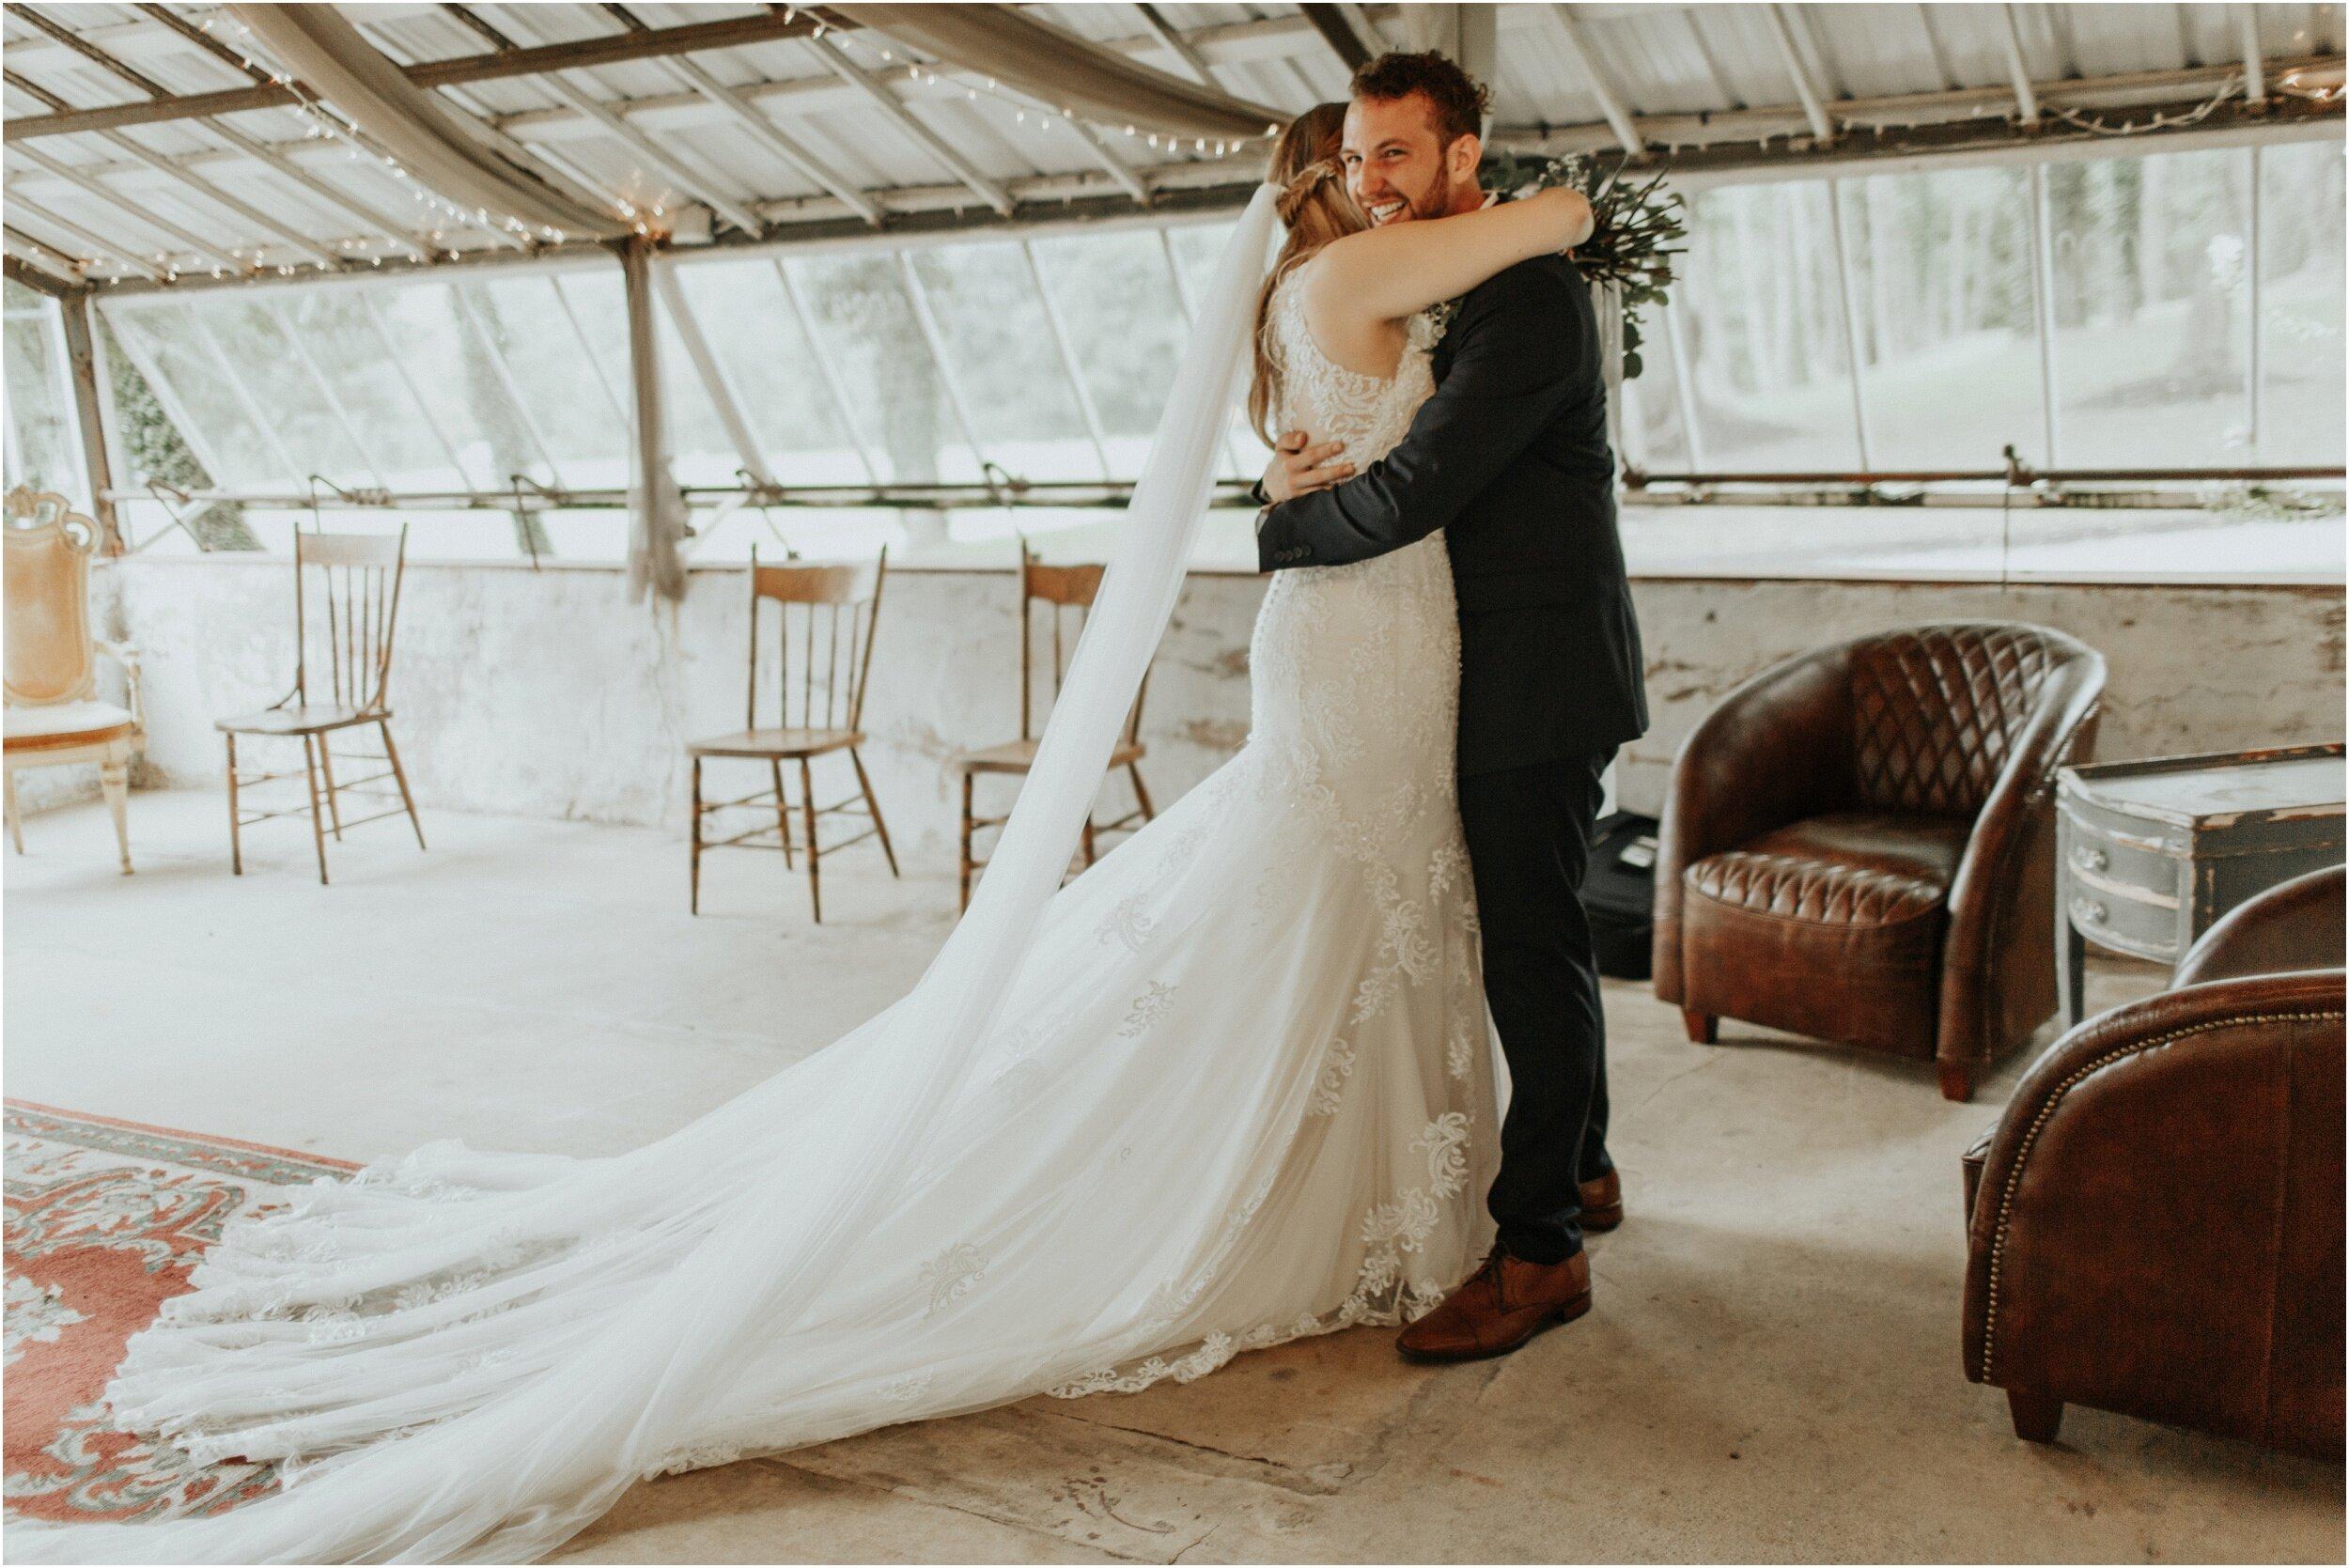 steph-and-jordan-cox-our-wedding-historic-shady-lane-compass-wedding-collective-hazel-lining-photography-destination-elopement-wedding-engagement-photography_0035.jpg